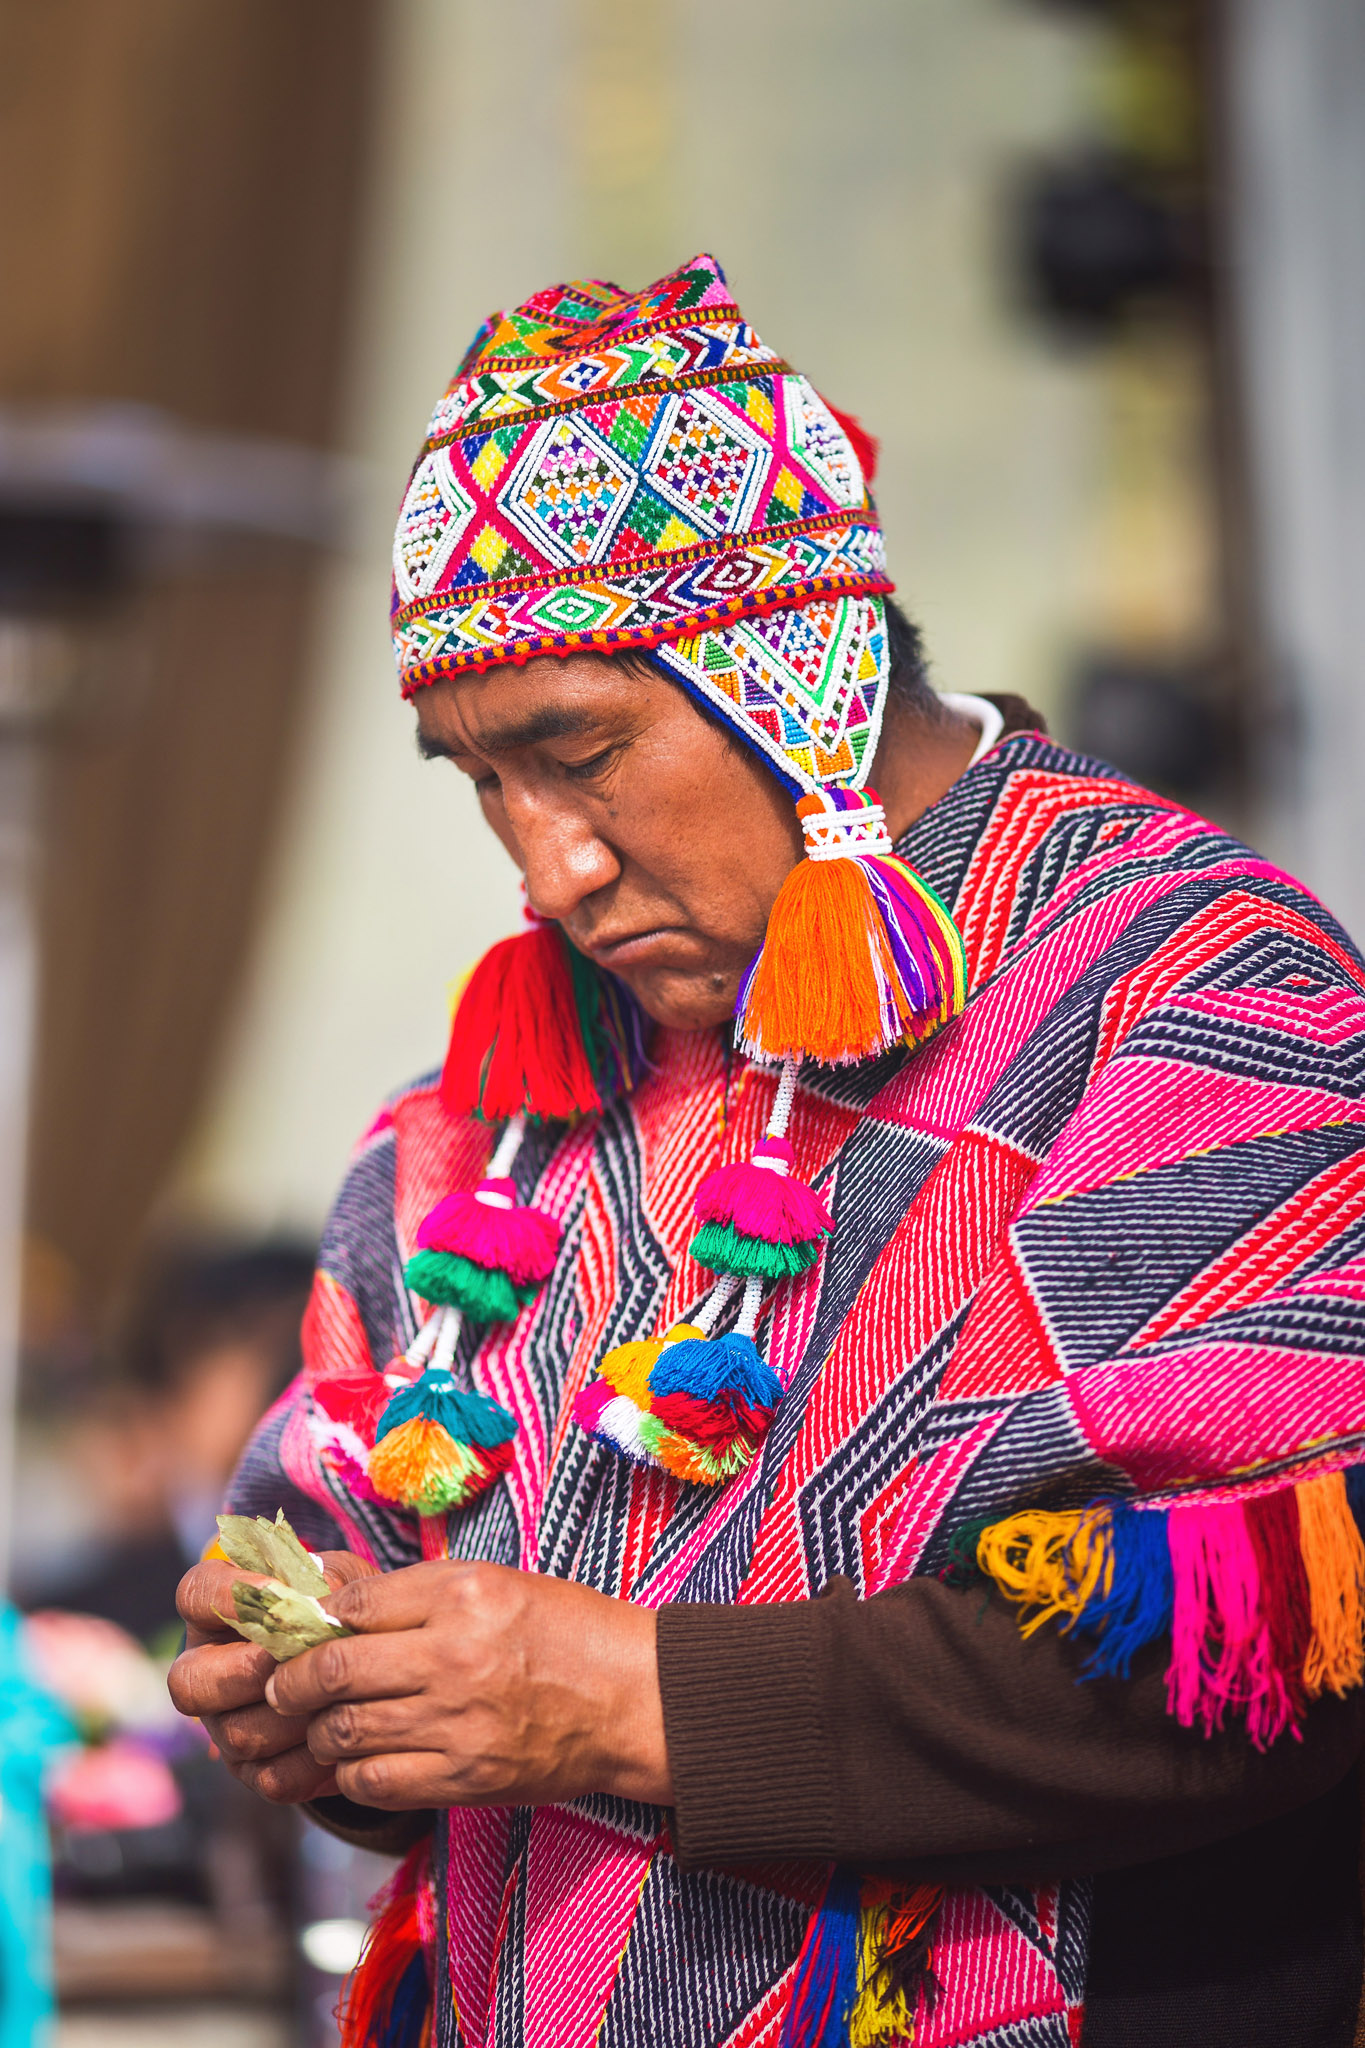 Wedding-Travellers-Destination-Wedding-Peru-Cusco-Hacienda-Sarapampa-Sacred-Valley-traditional-andean-ceremony-shaman-coca-leaf-preparing-despacho